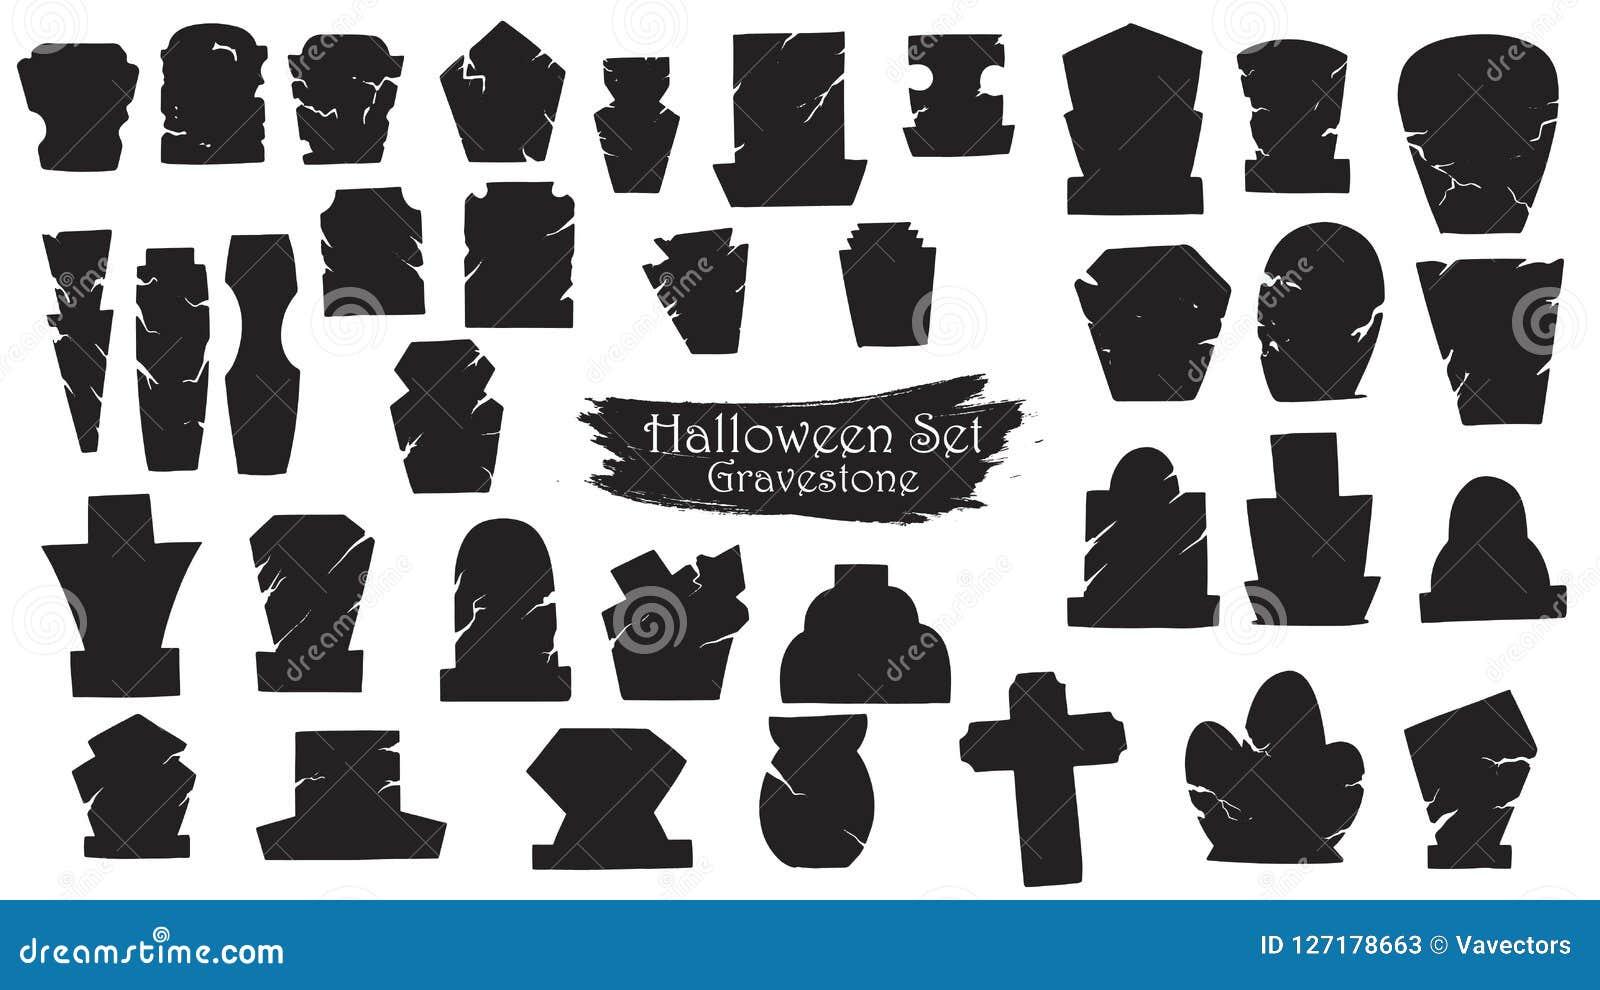 Strasznego gravestone sylwetki cmentarniana kolekcja Halloween ve